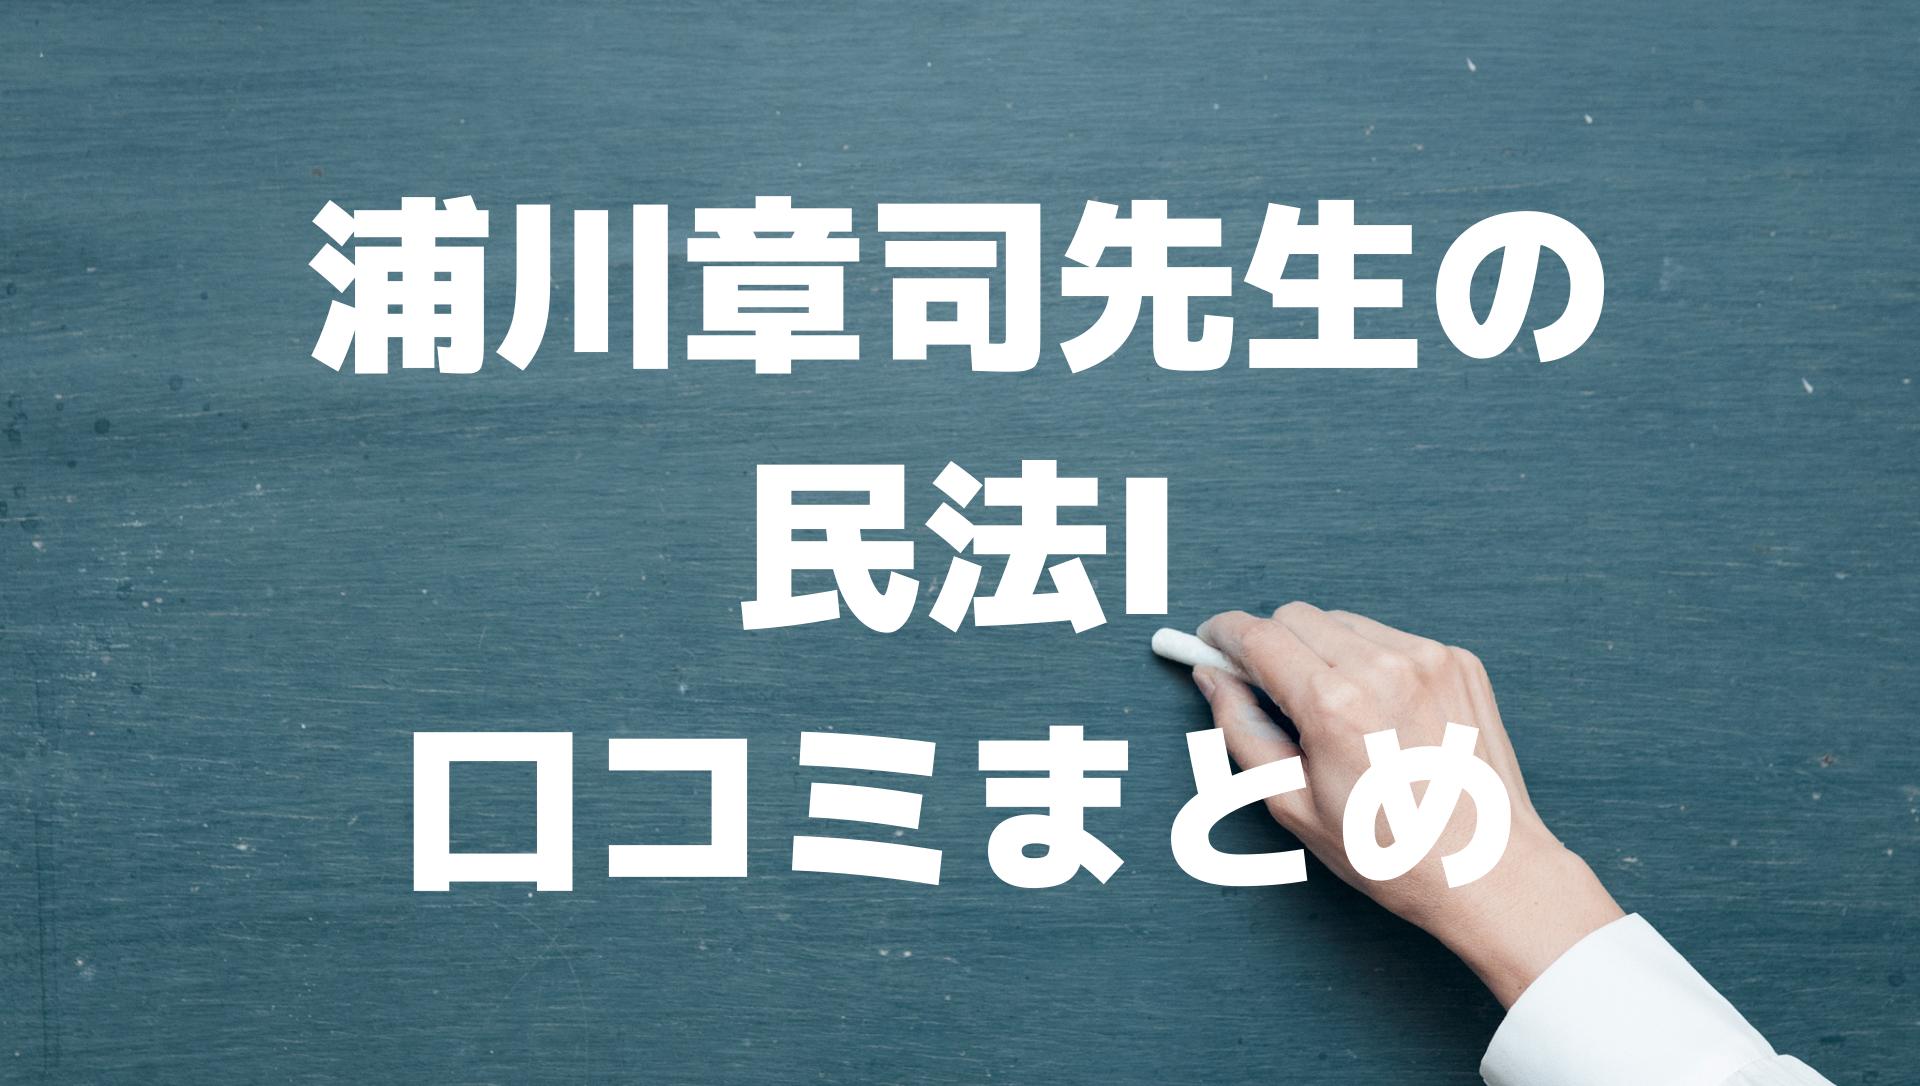 浦川章司先生の民法I